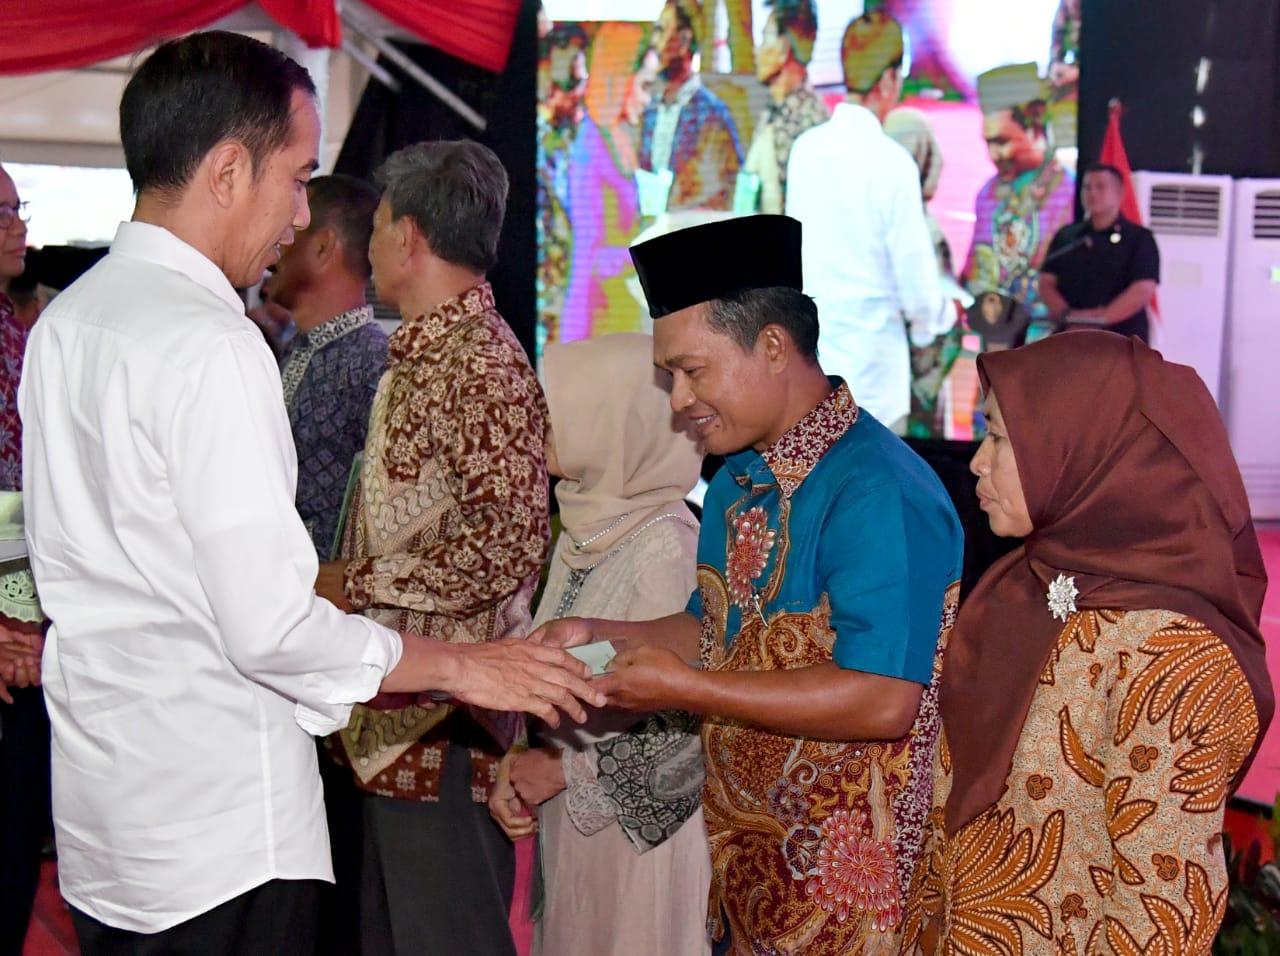 presiden-serahkan-10-000-sertifikat-tanah-untuk-rakyat-ke-warga-jakarta-utara-11